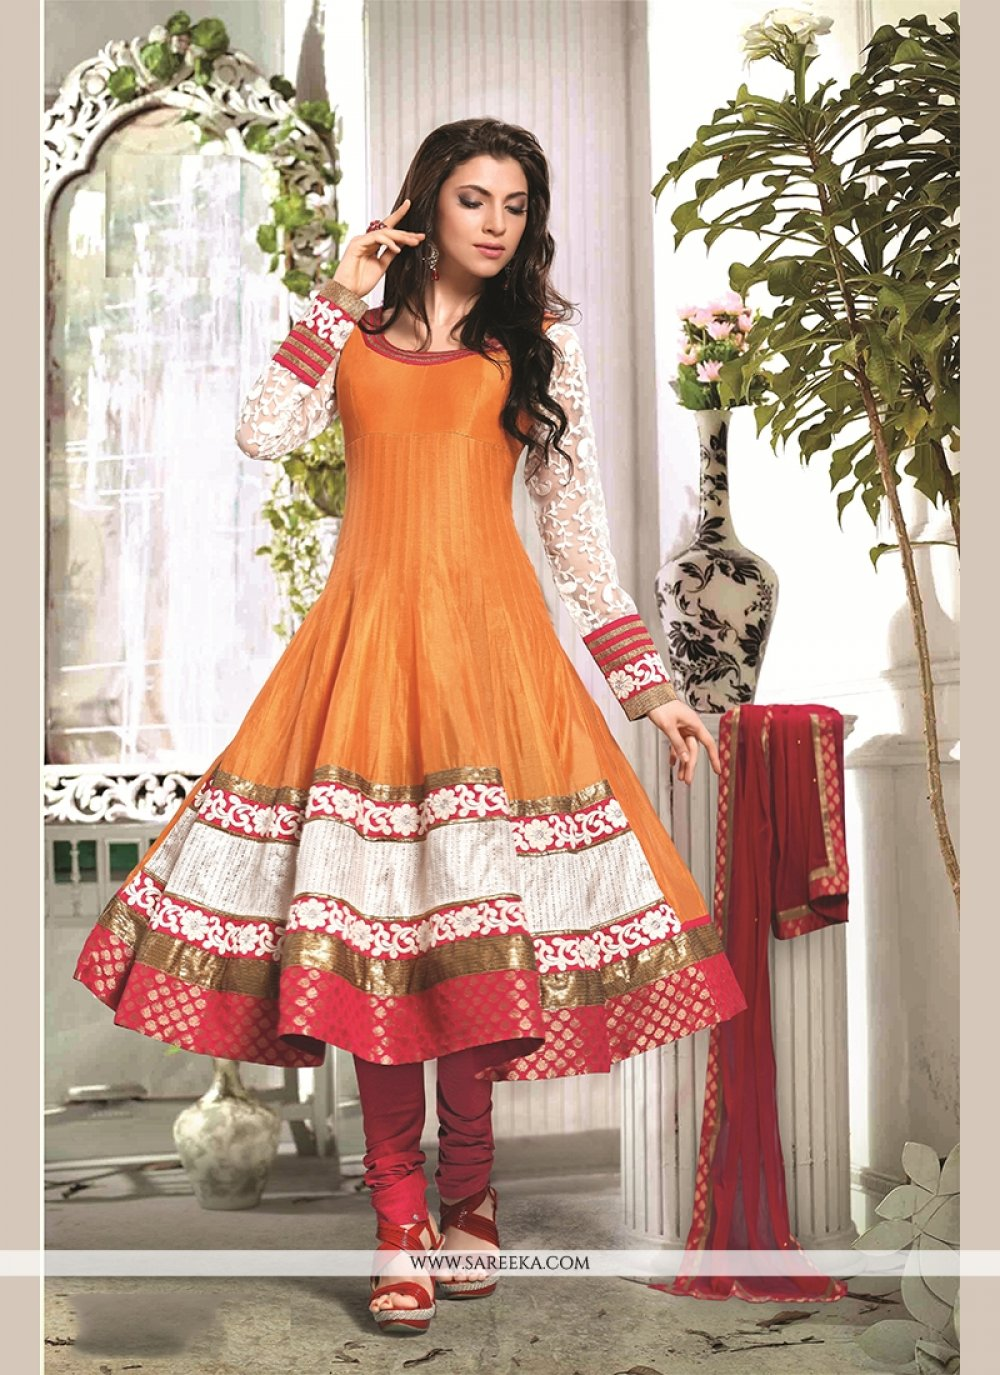 Chanderi Cotton Orange Patch Border Work Readymade Suit